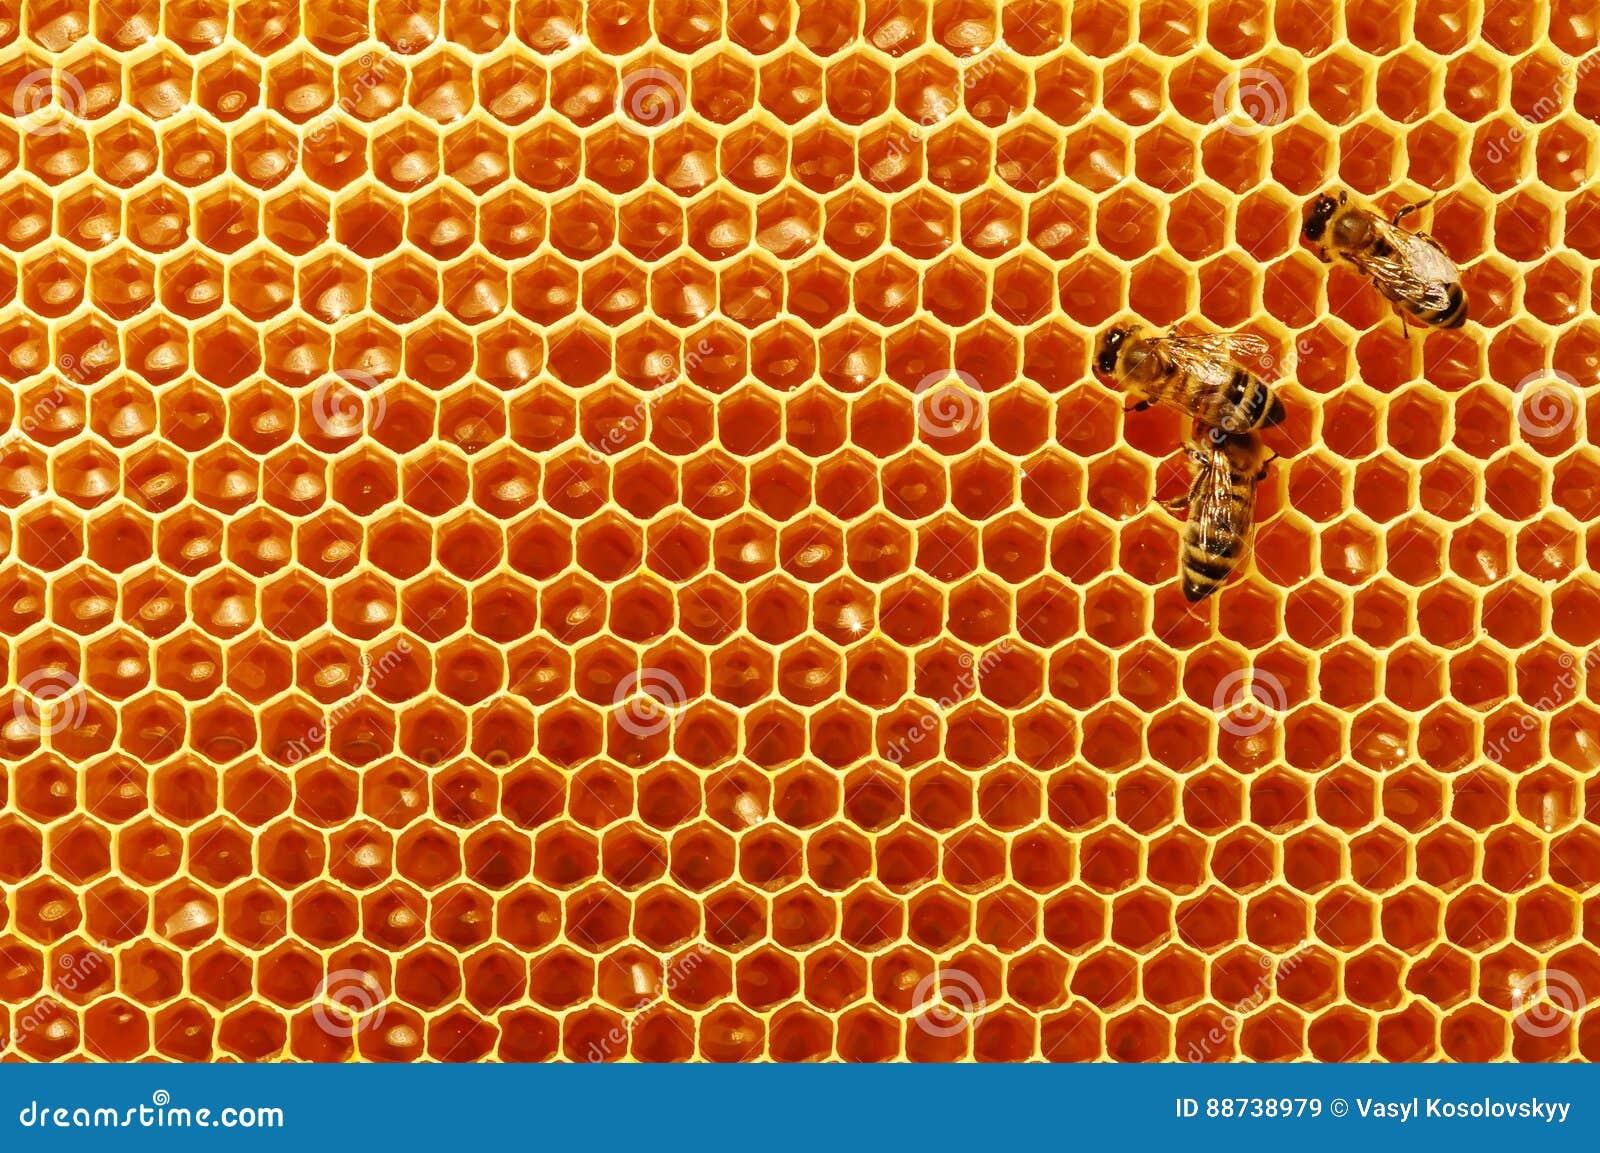 Bihonungskakor med honung och bin Biodling